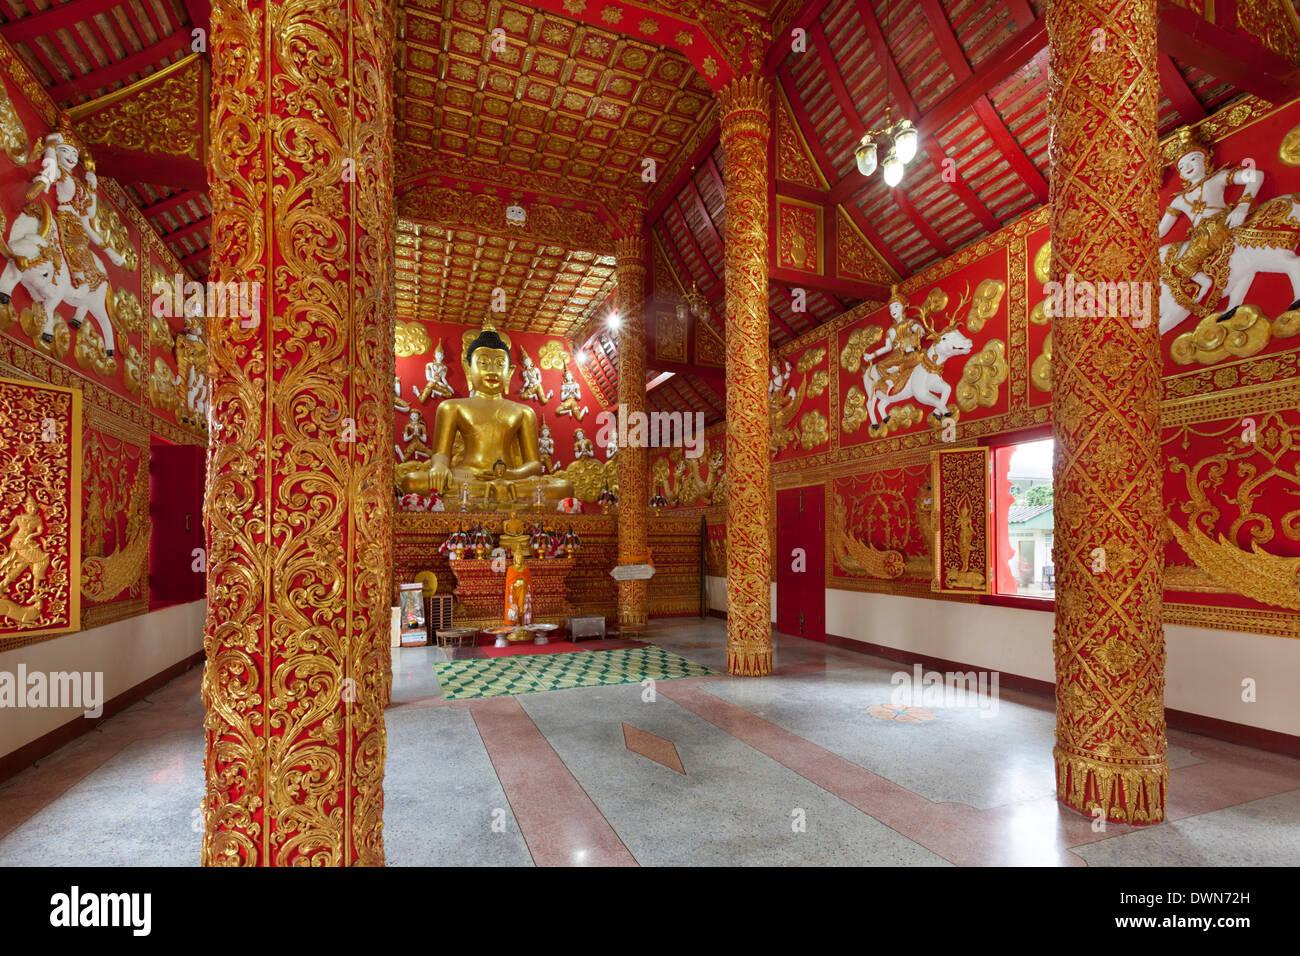 Prayer hall of Wat Phra That Lampang Luang Buddhist temple, Lampang, Northern Thailand, Thailand, Southeast Asia, Asia - Stock Image